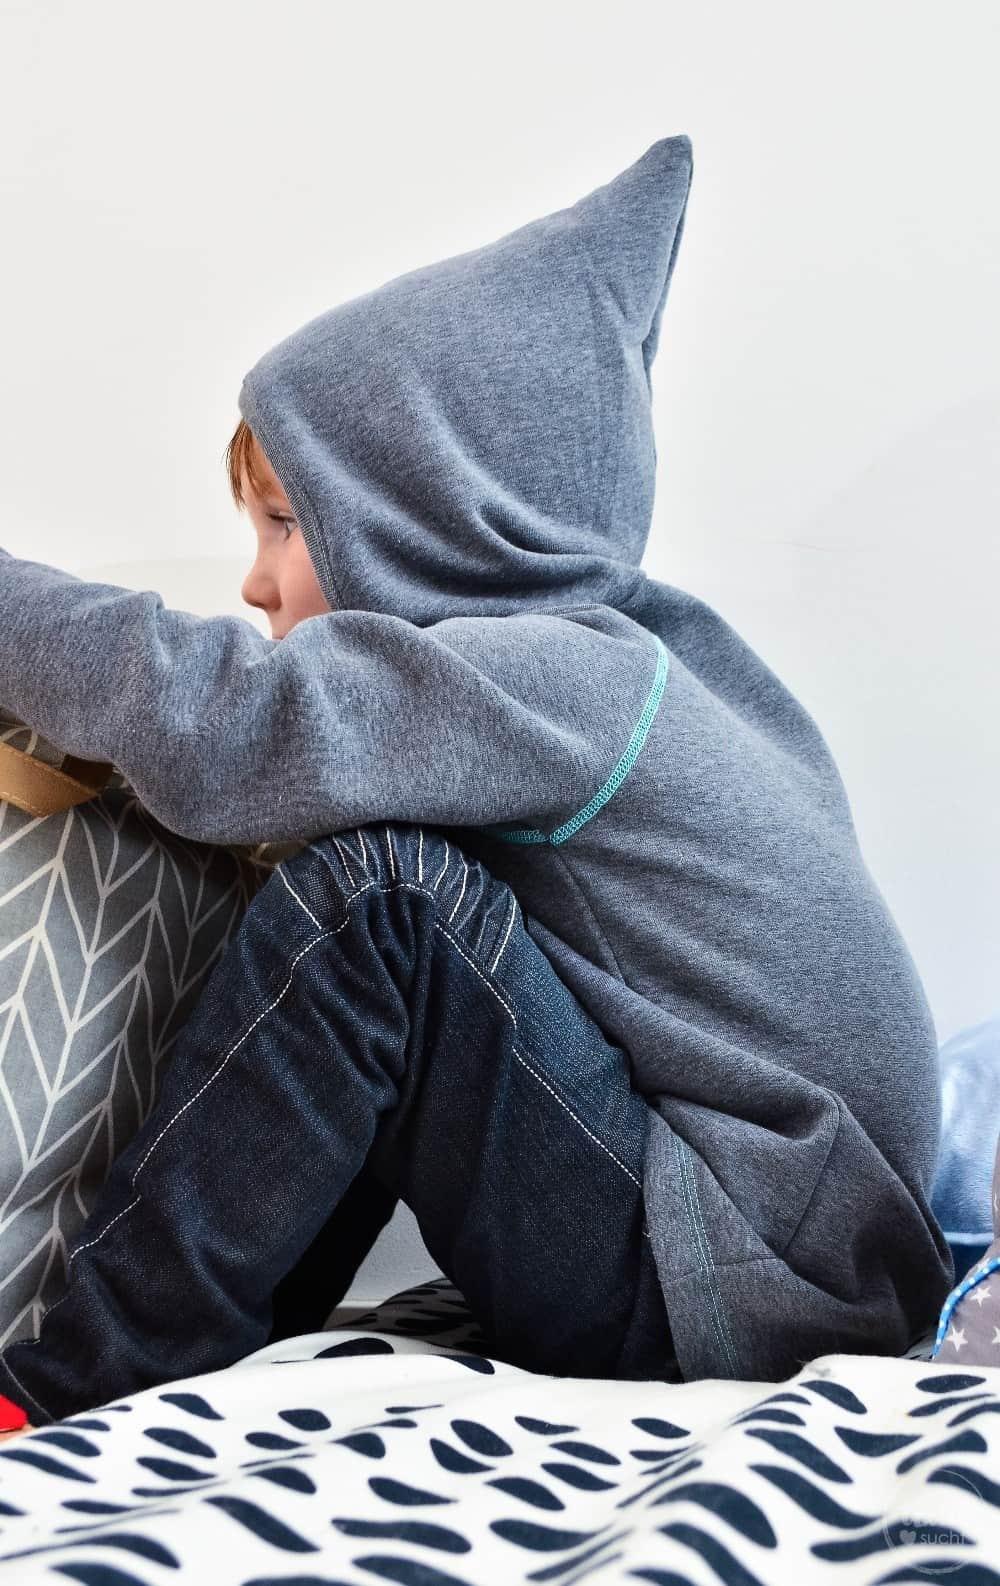 Kapuzenpullover nähen: Raglansweater Max und Maxi - Bild 1 | textilsucht.de